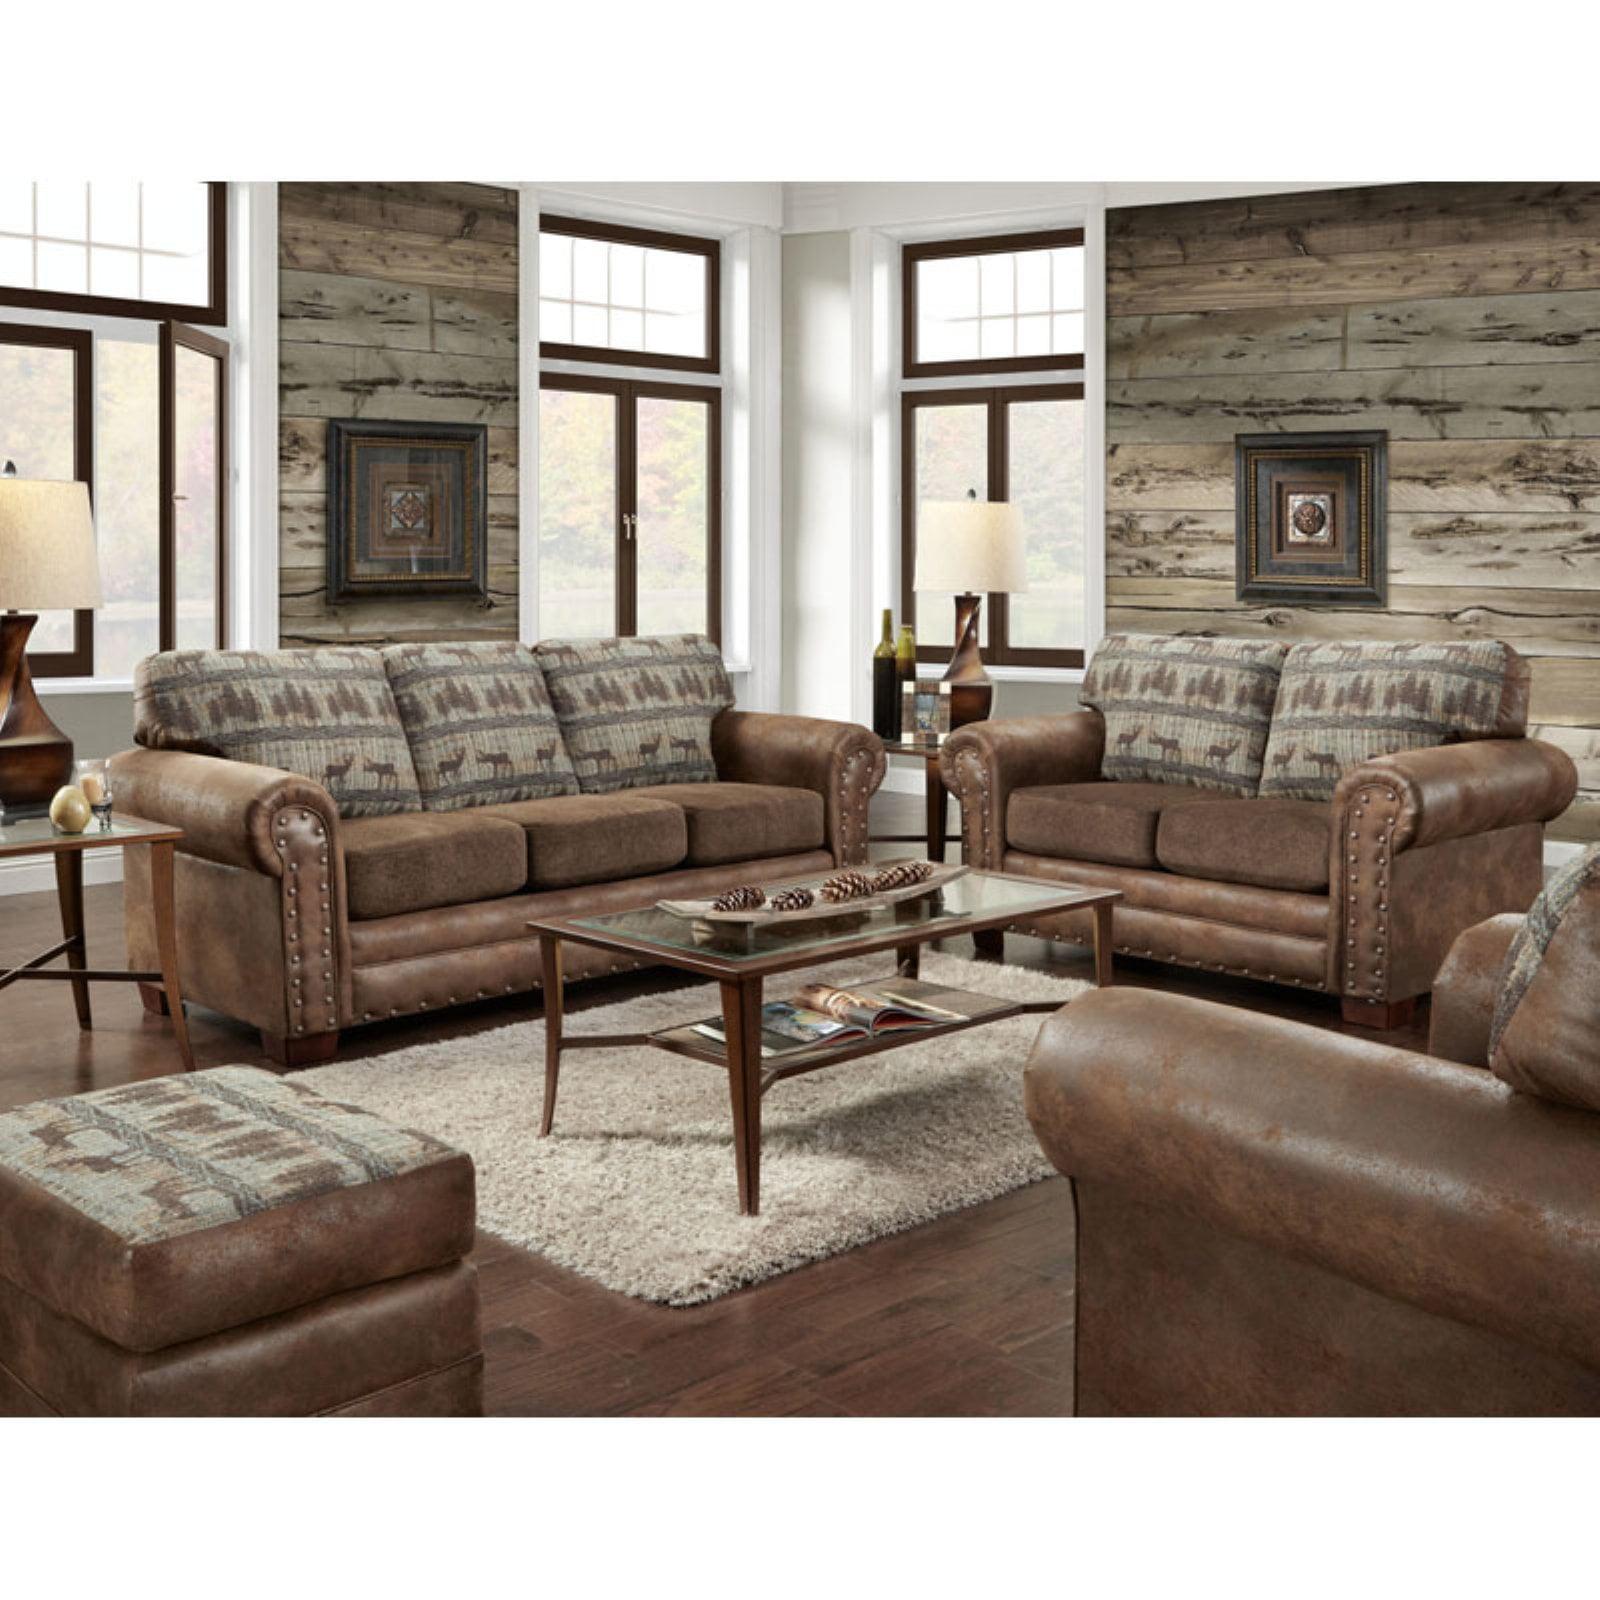 American Furniture Classics Deer Teal Lodge 4 Piece Sofa Set